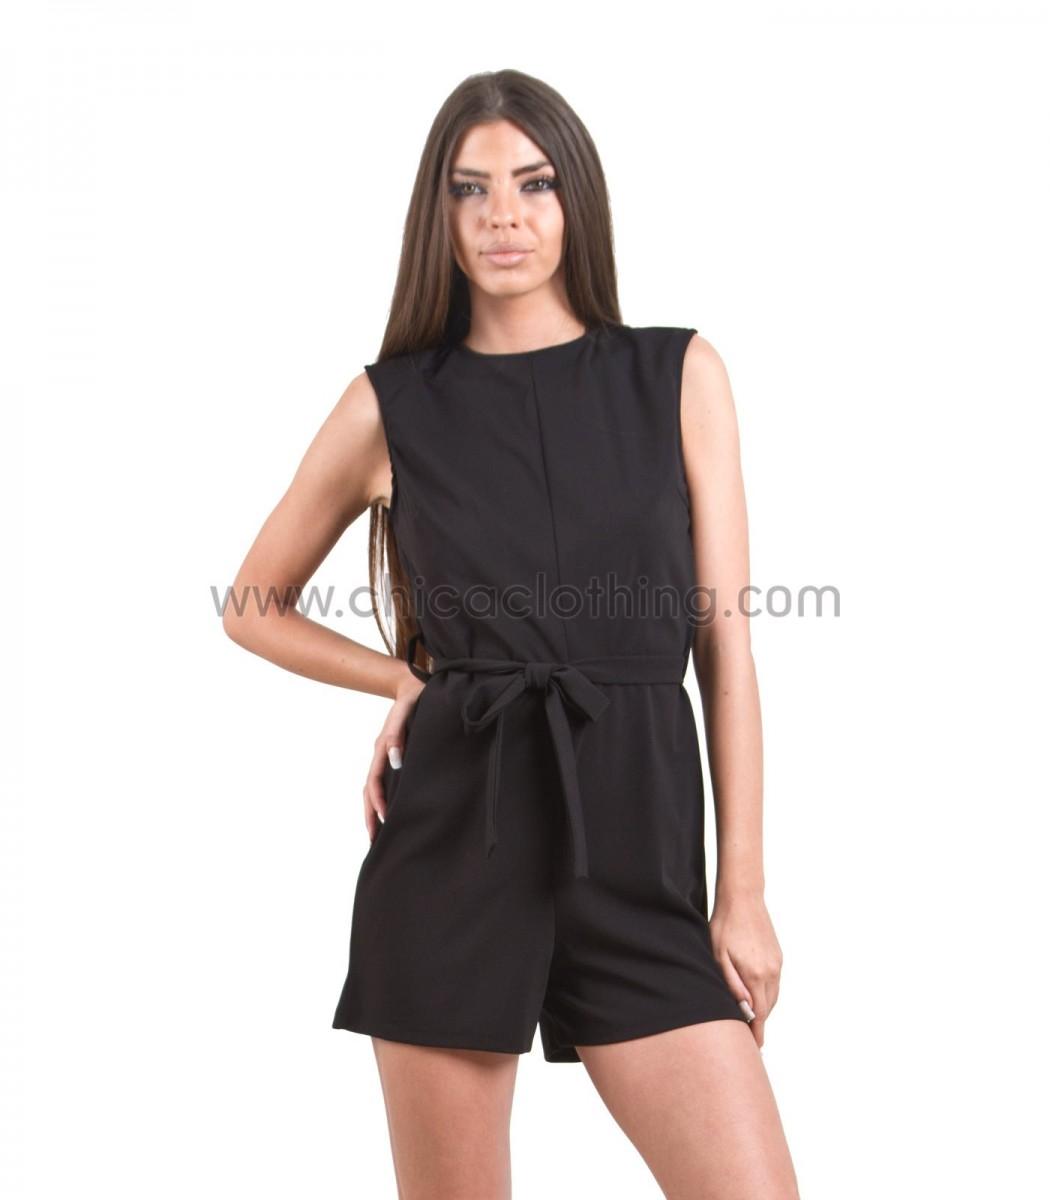 d550debd724 Ολόσωμη φόρμα σορτς μαύρη